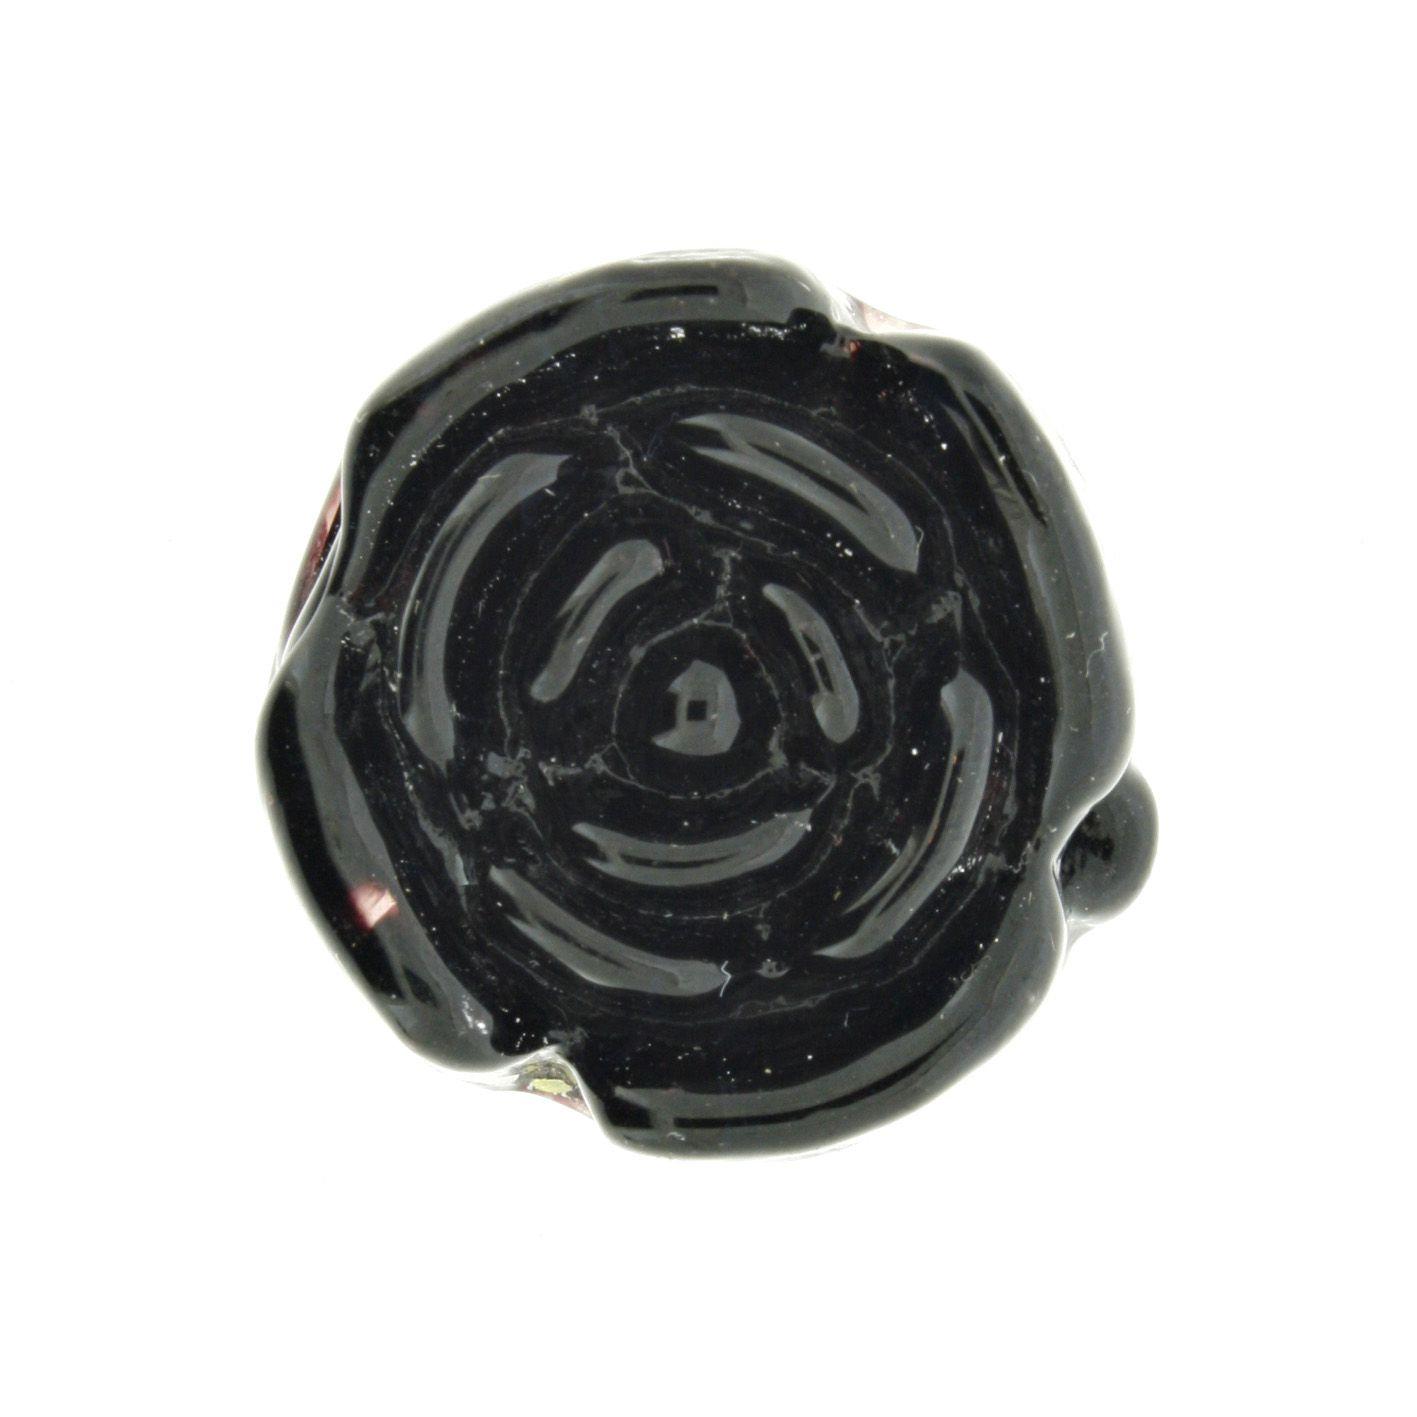 Firma Rosa - Preta - 1 Peça  - Stéphanie Bijoux® - Peças para Bijuterias e Artesanato